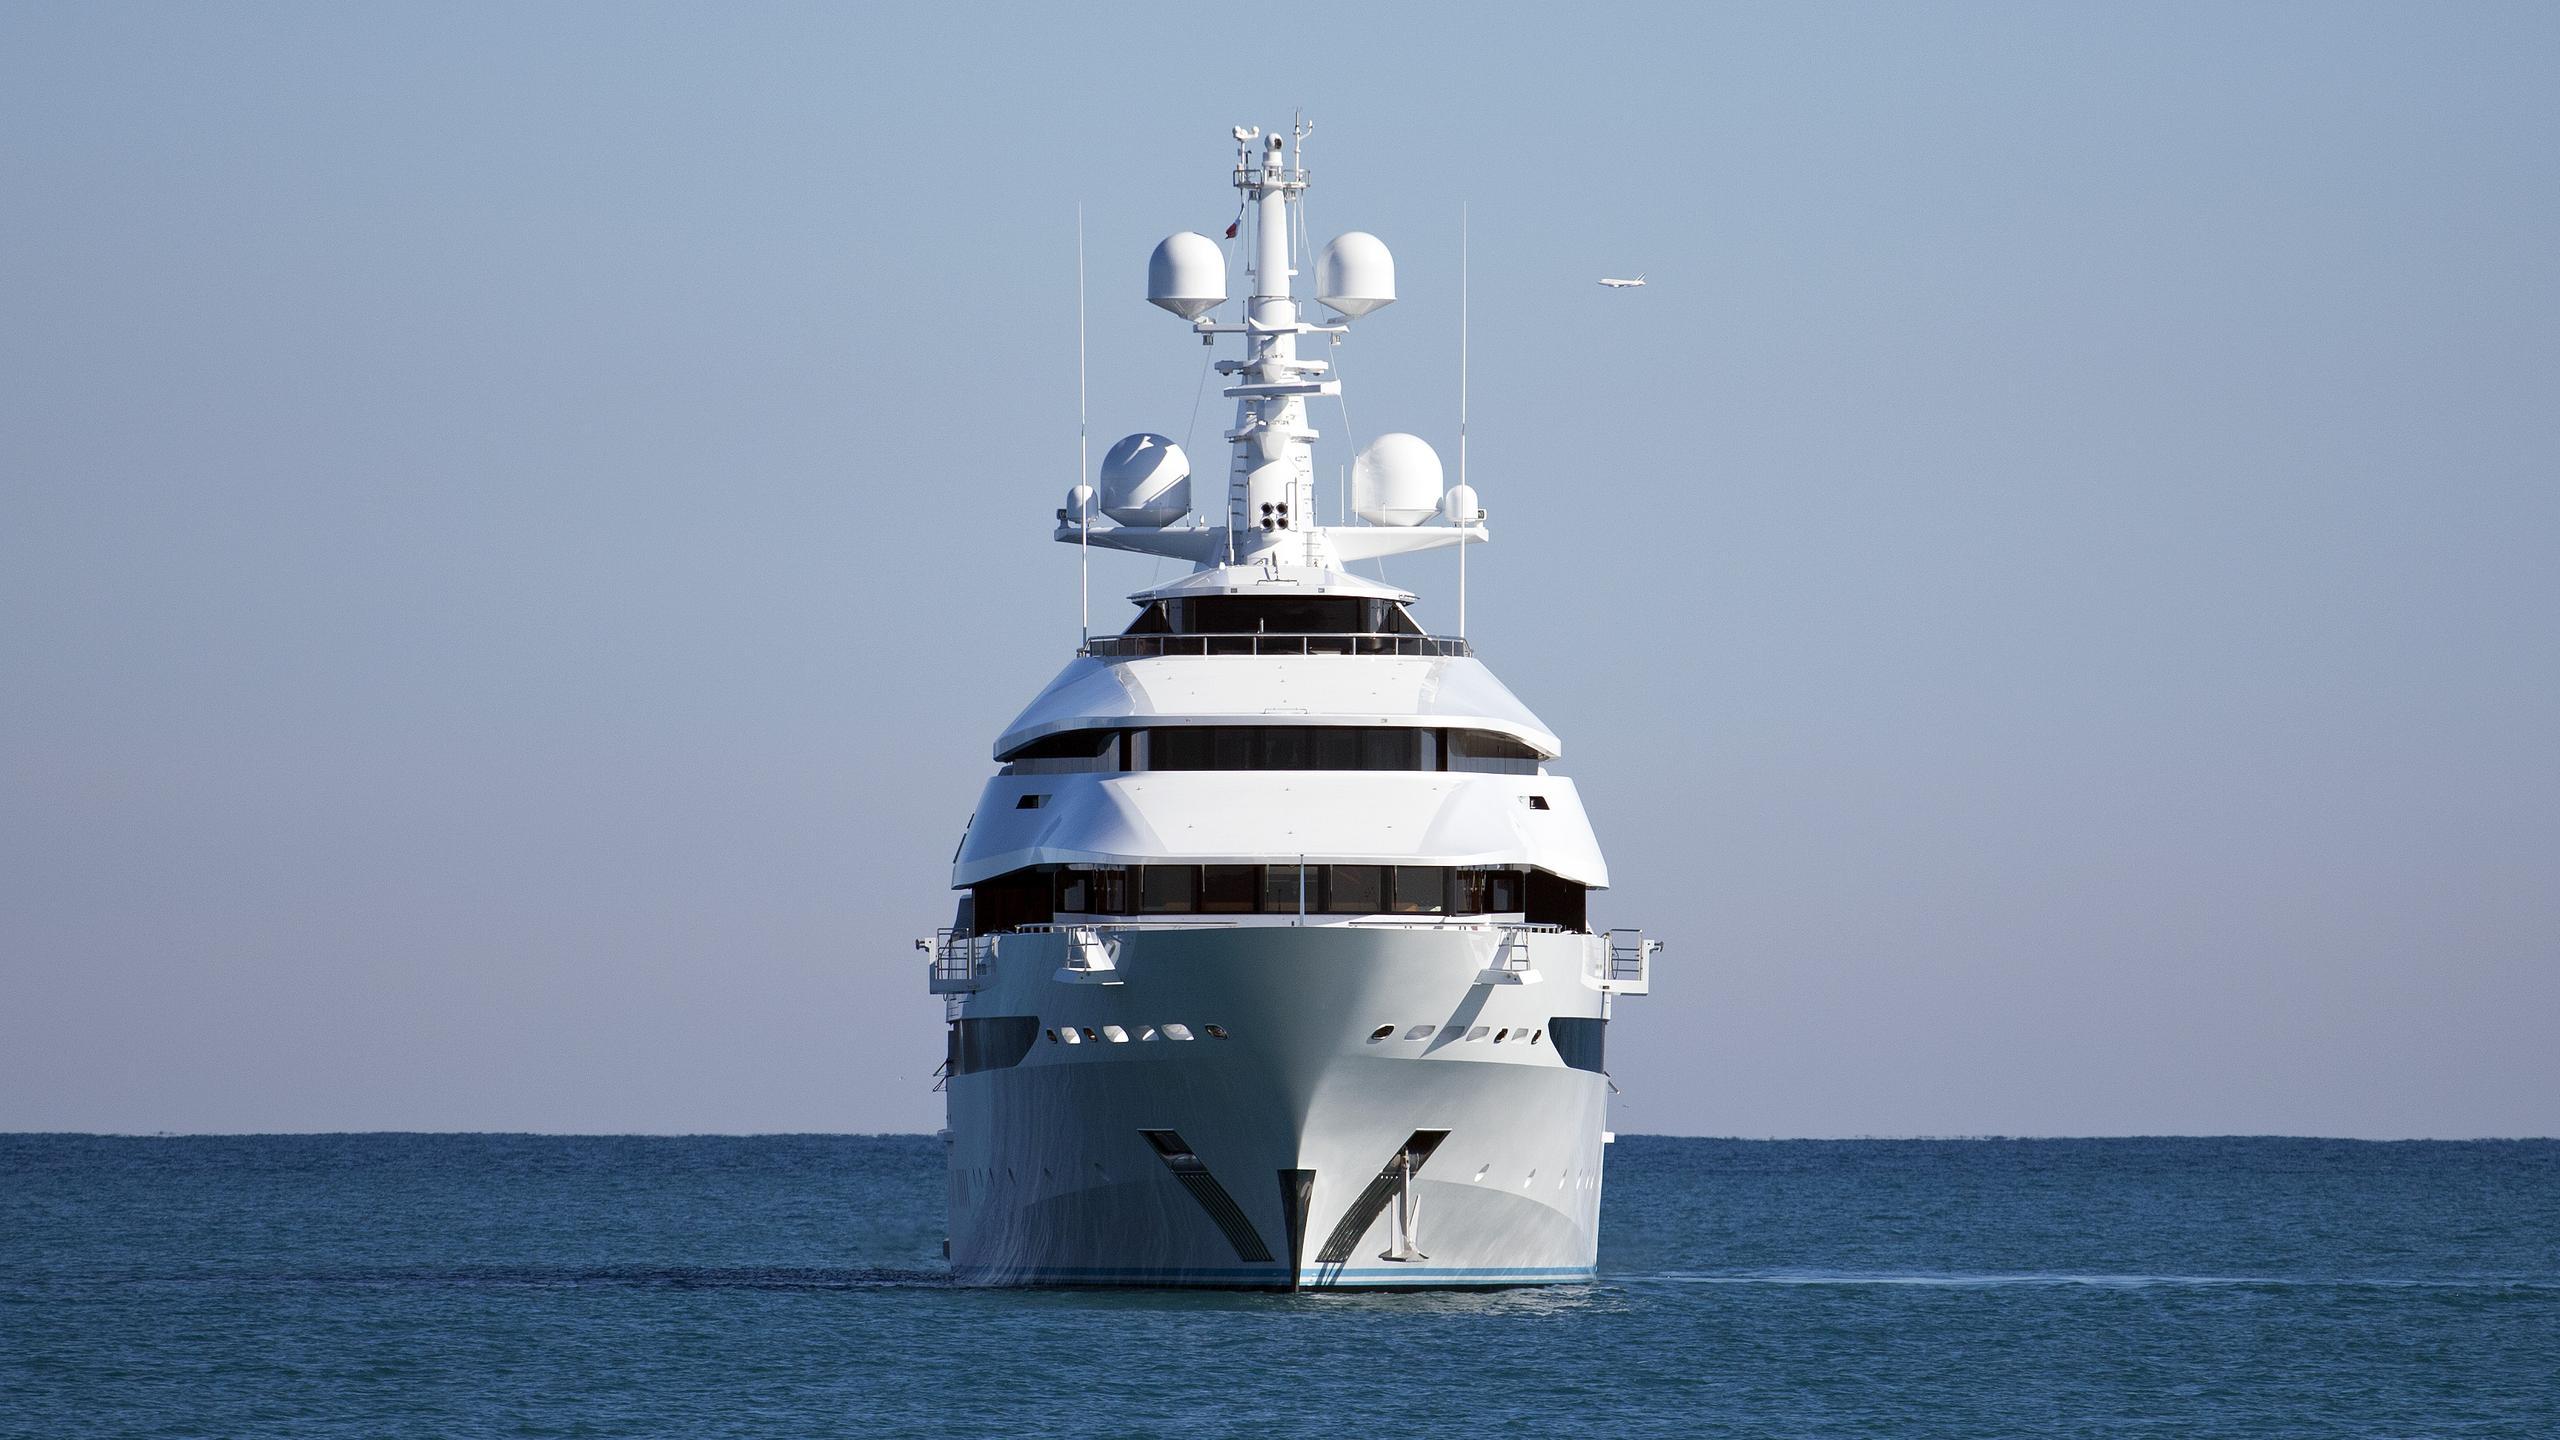 amore-vero-st-princess-olga-motor-yacht-oceanco-2013-86m-bow